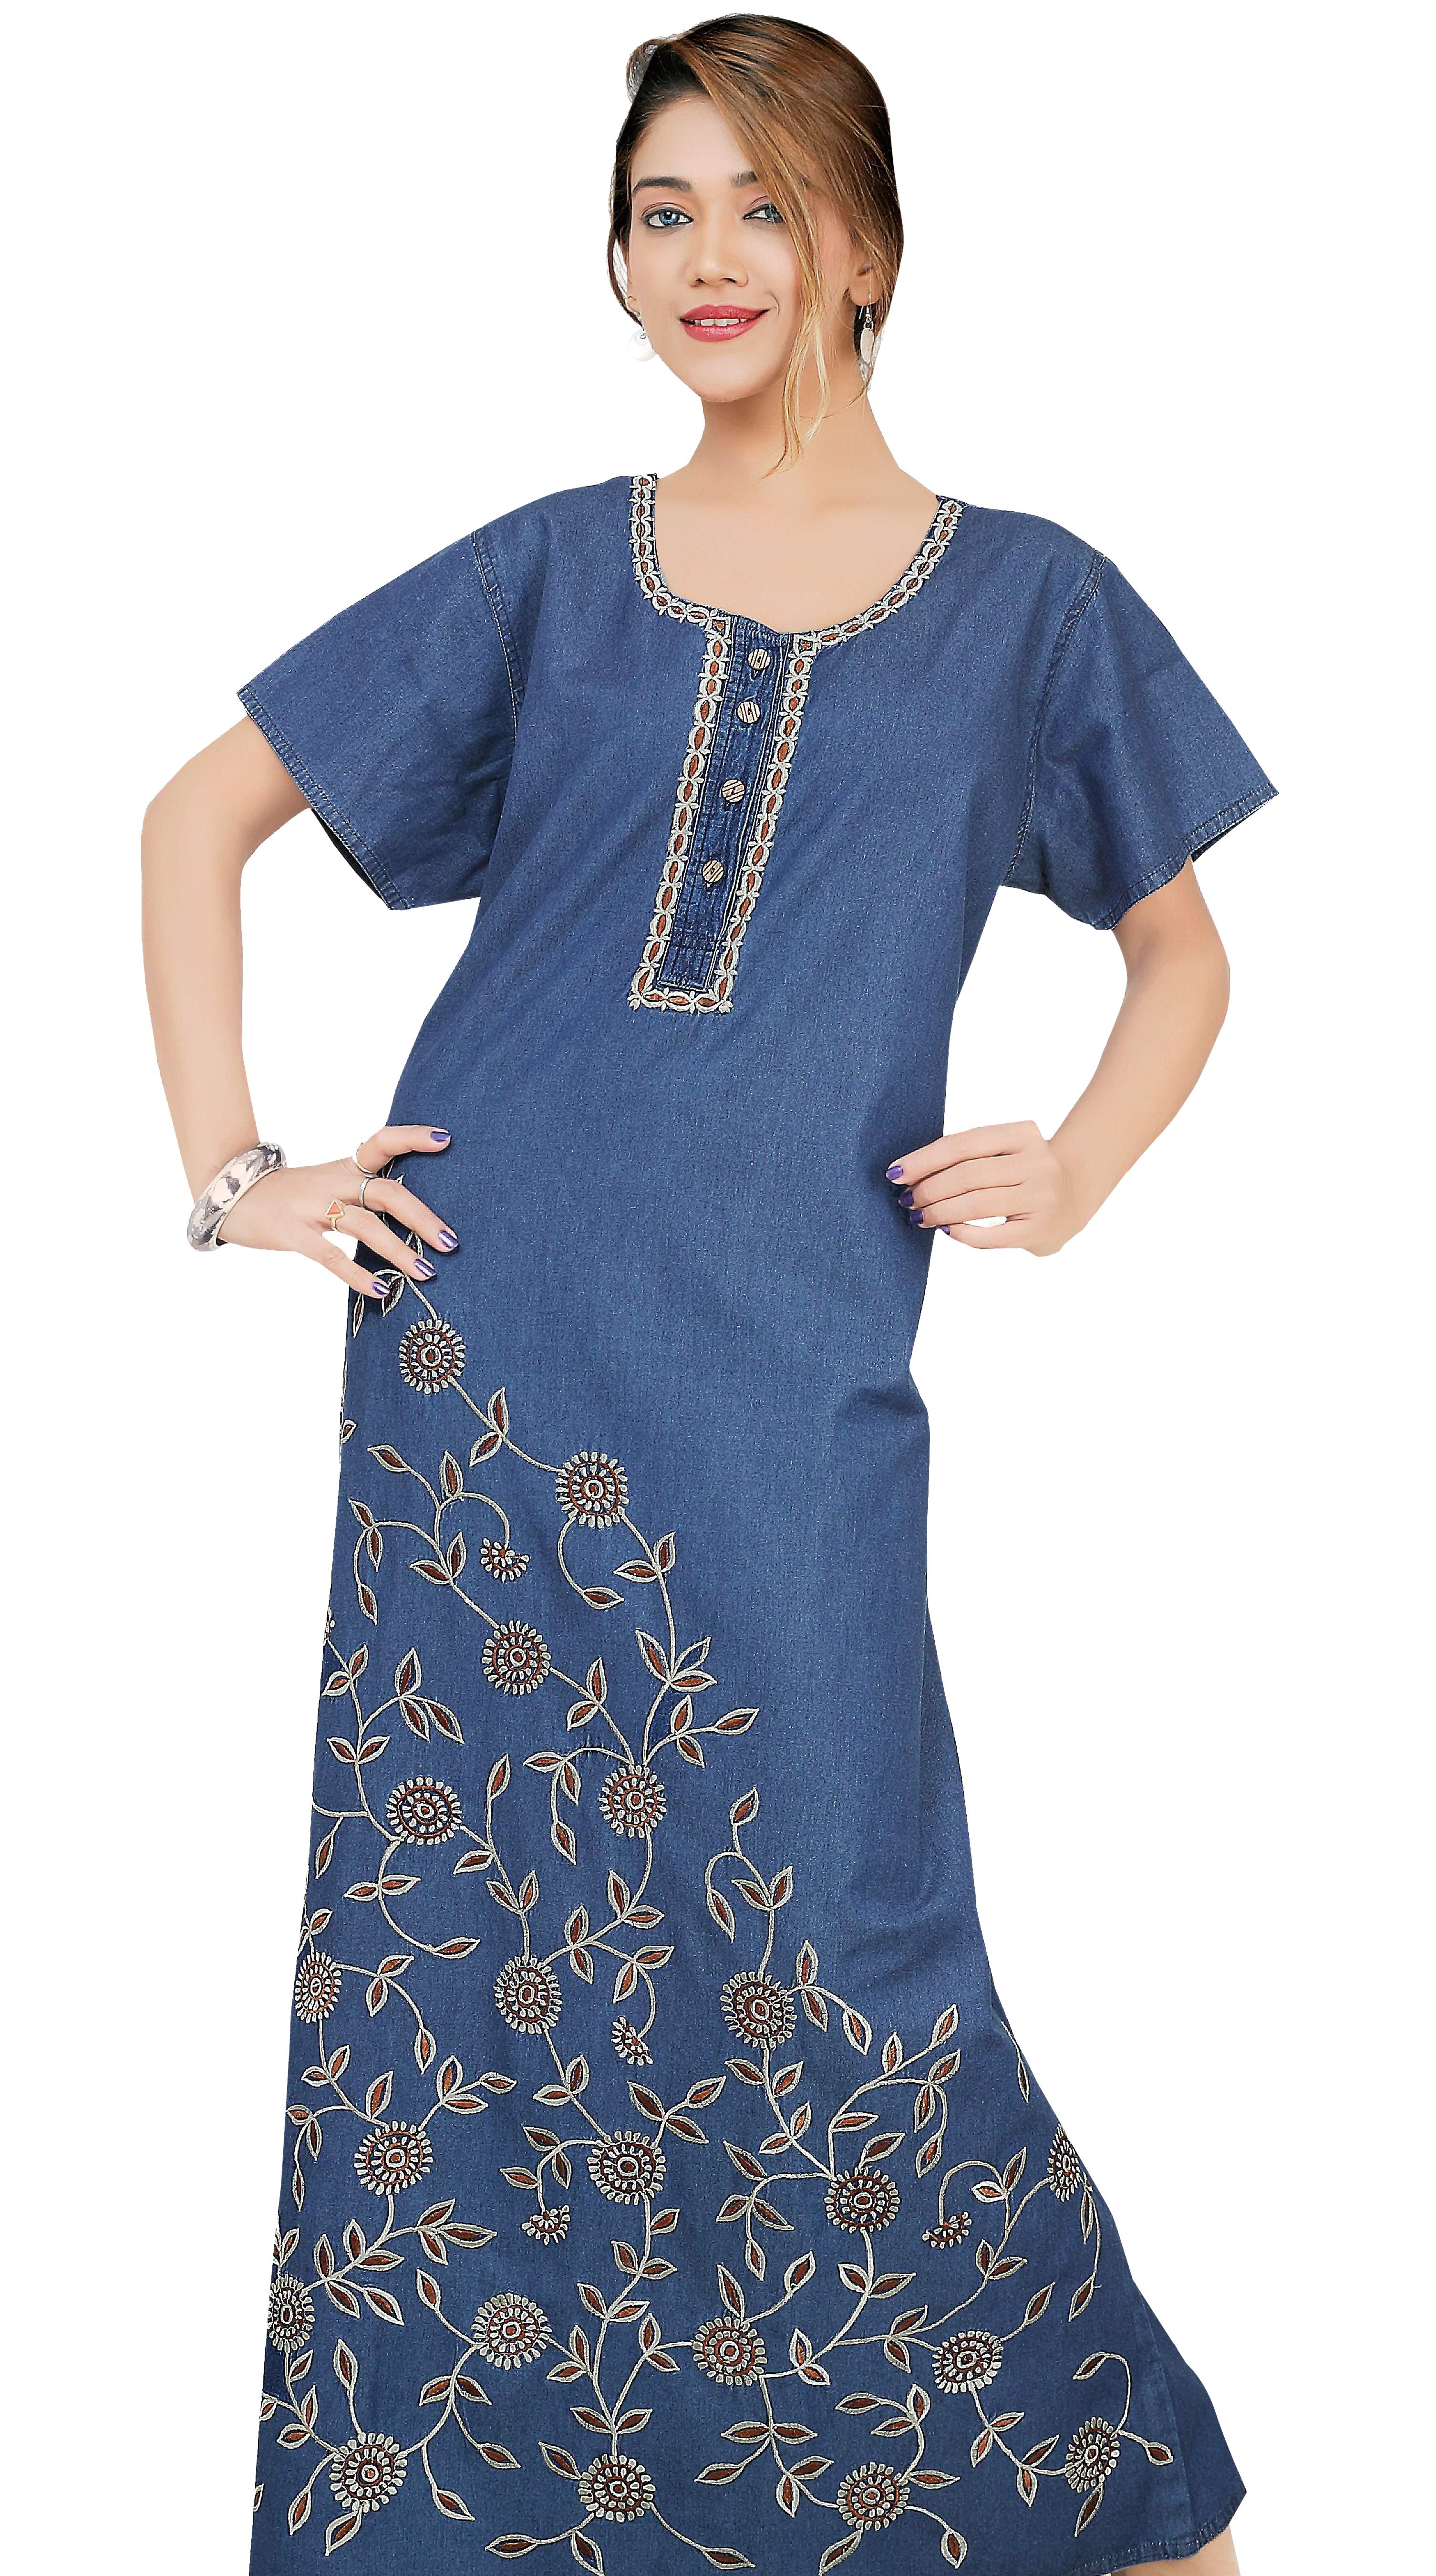 Latest Design Ladies: Indian Women Nightwear Latest Nighty Designs And Style